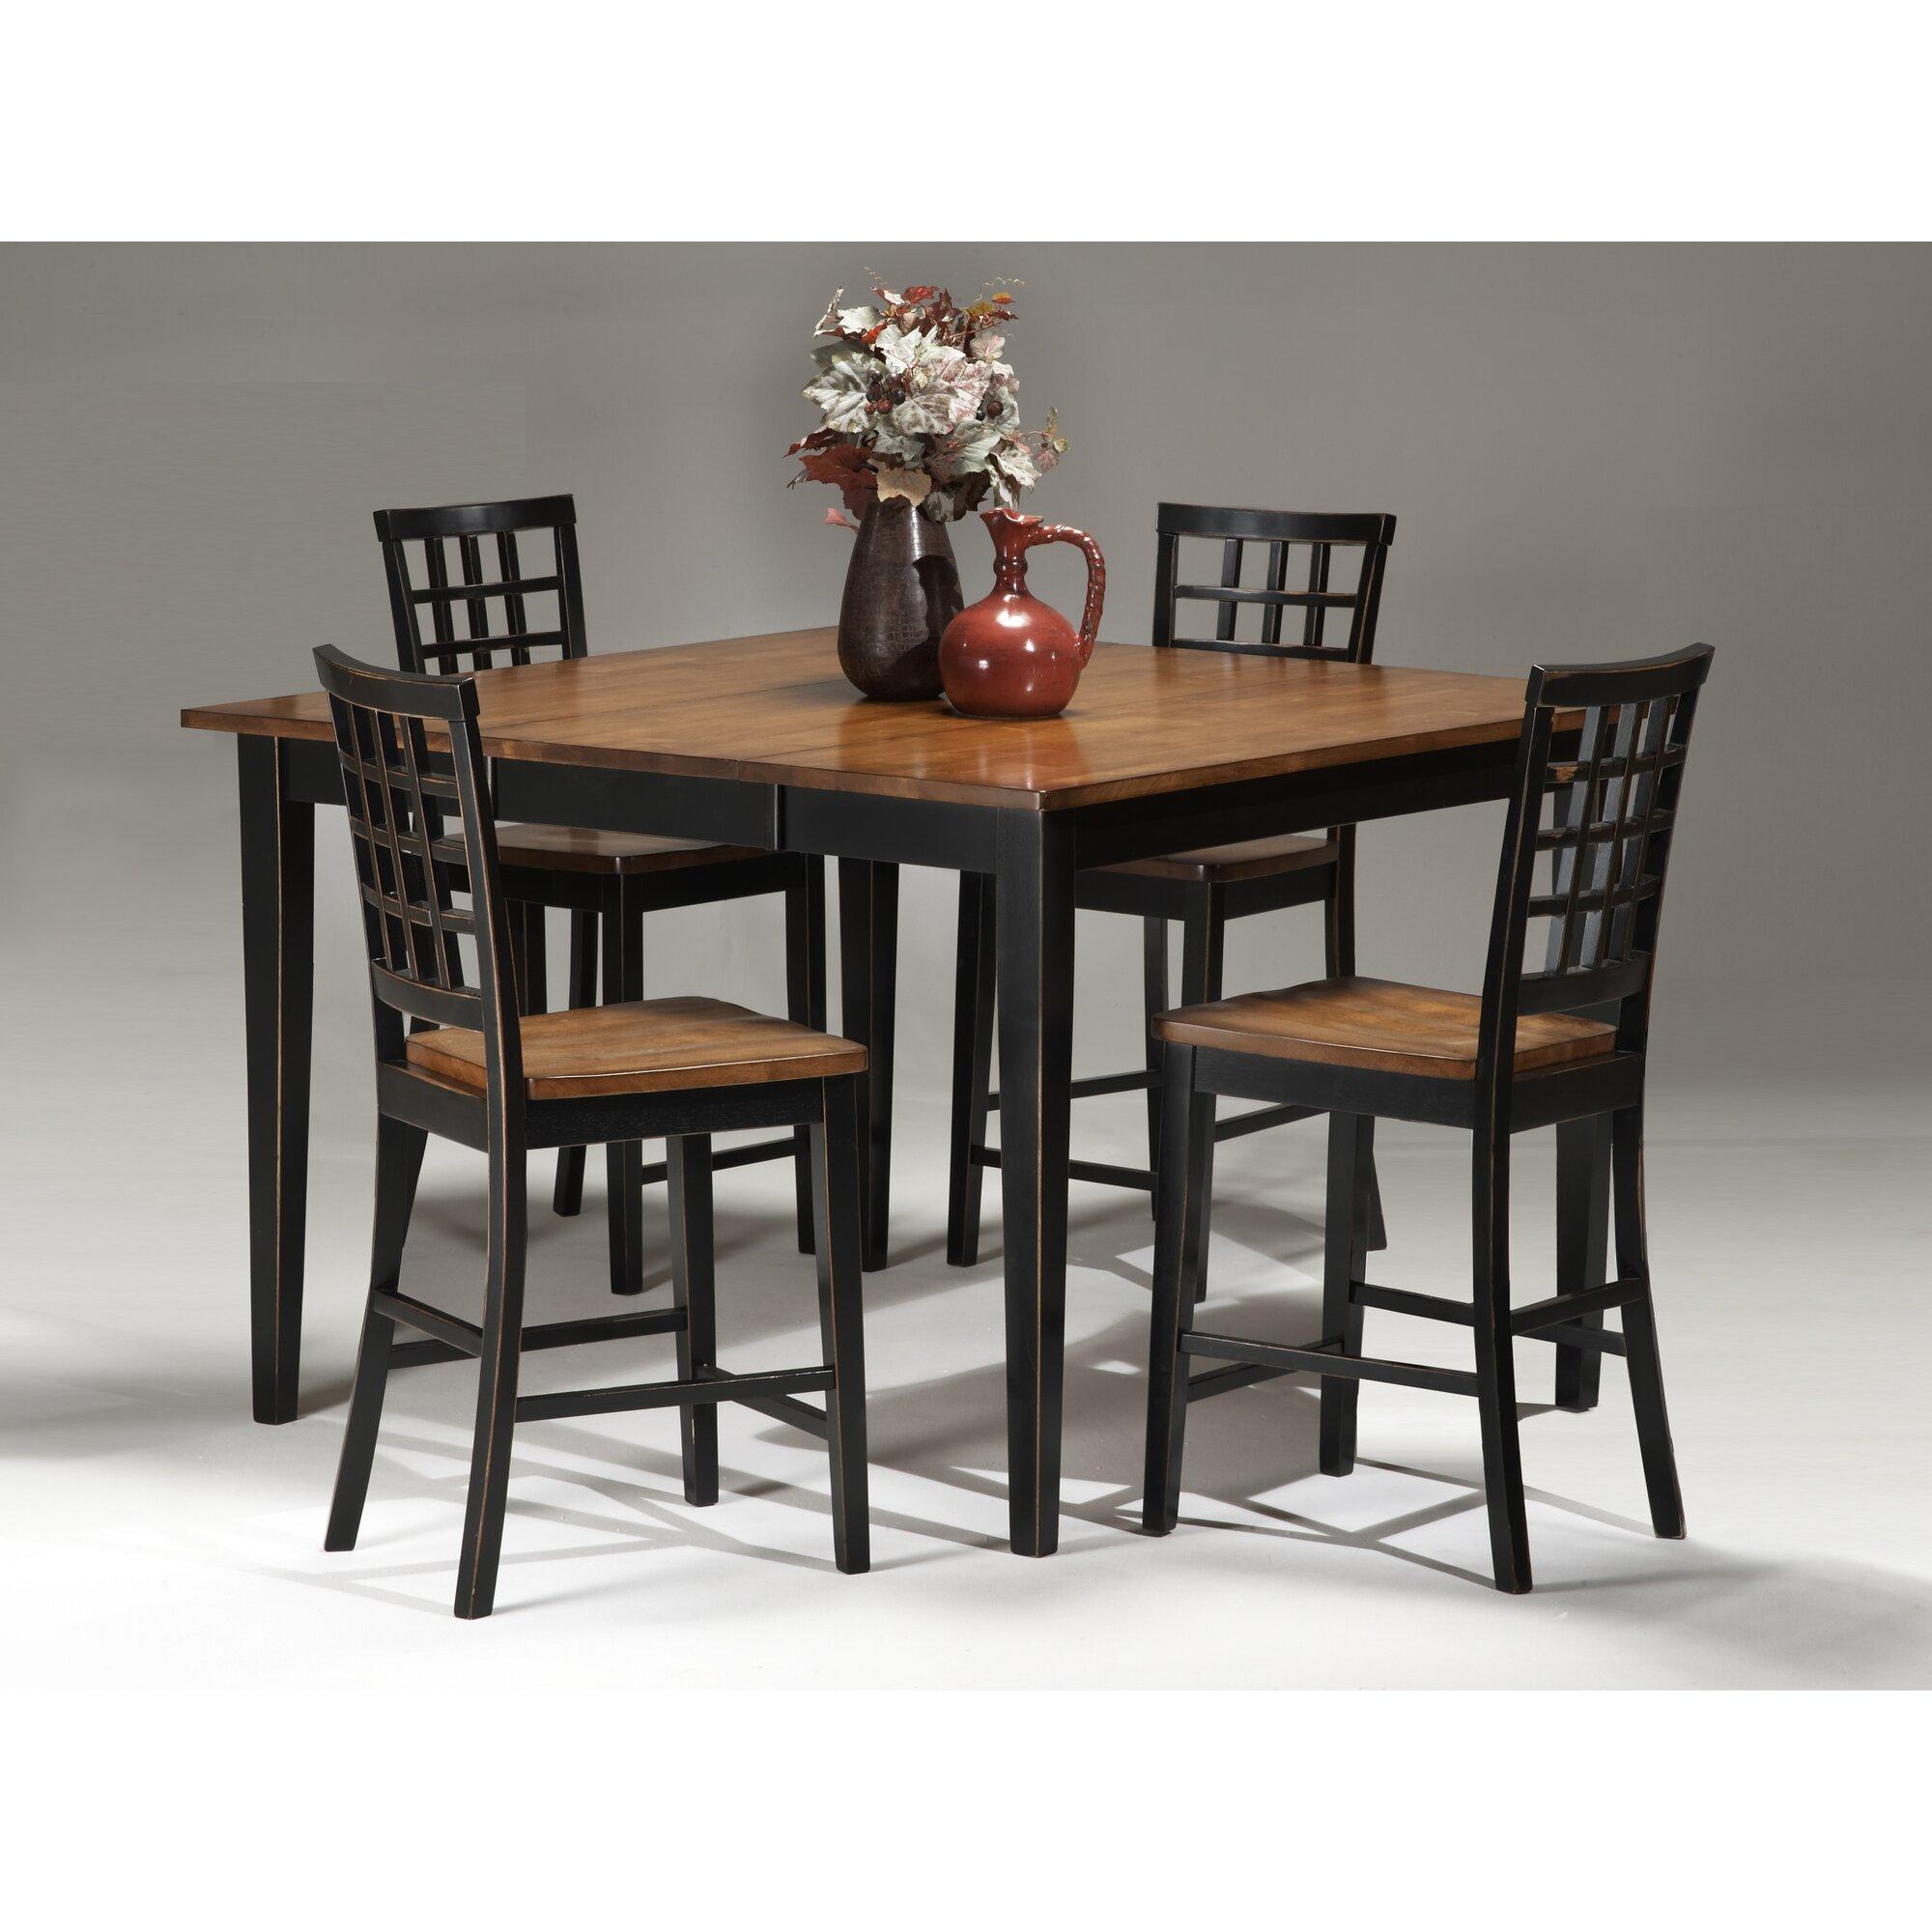 Imagio Home Arlington Counter Height Gathering Table Reviews .